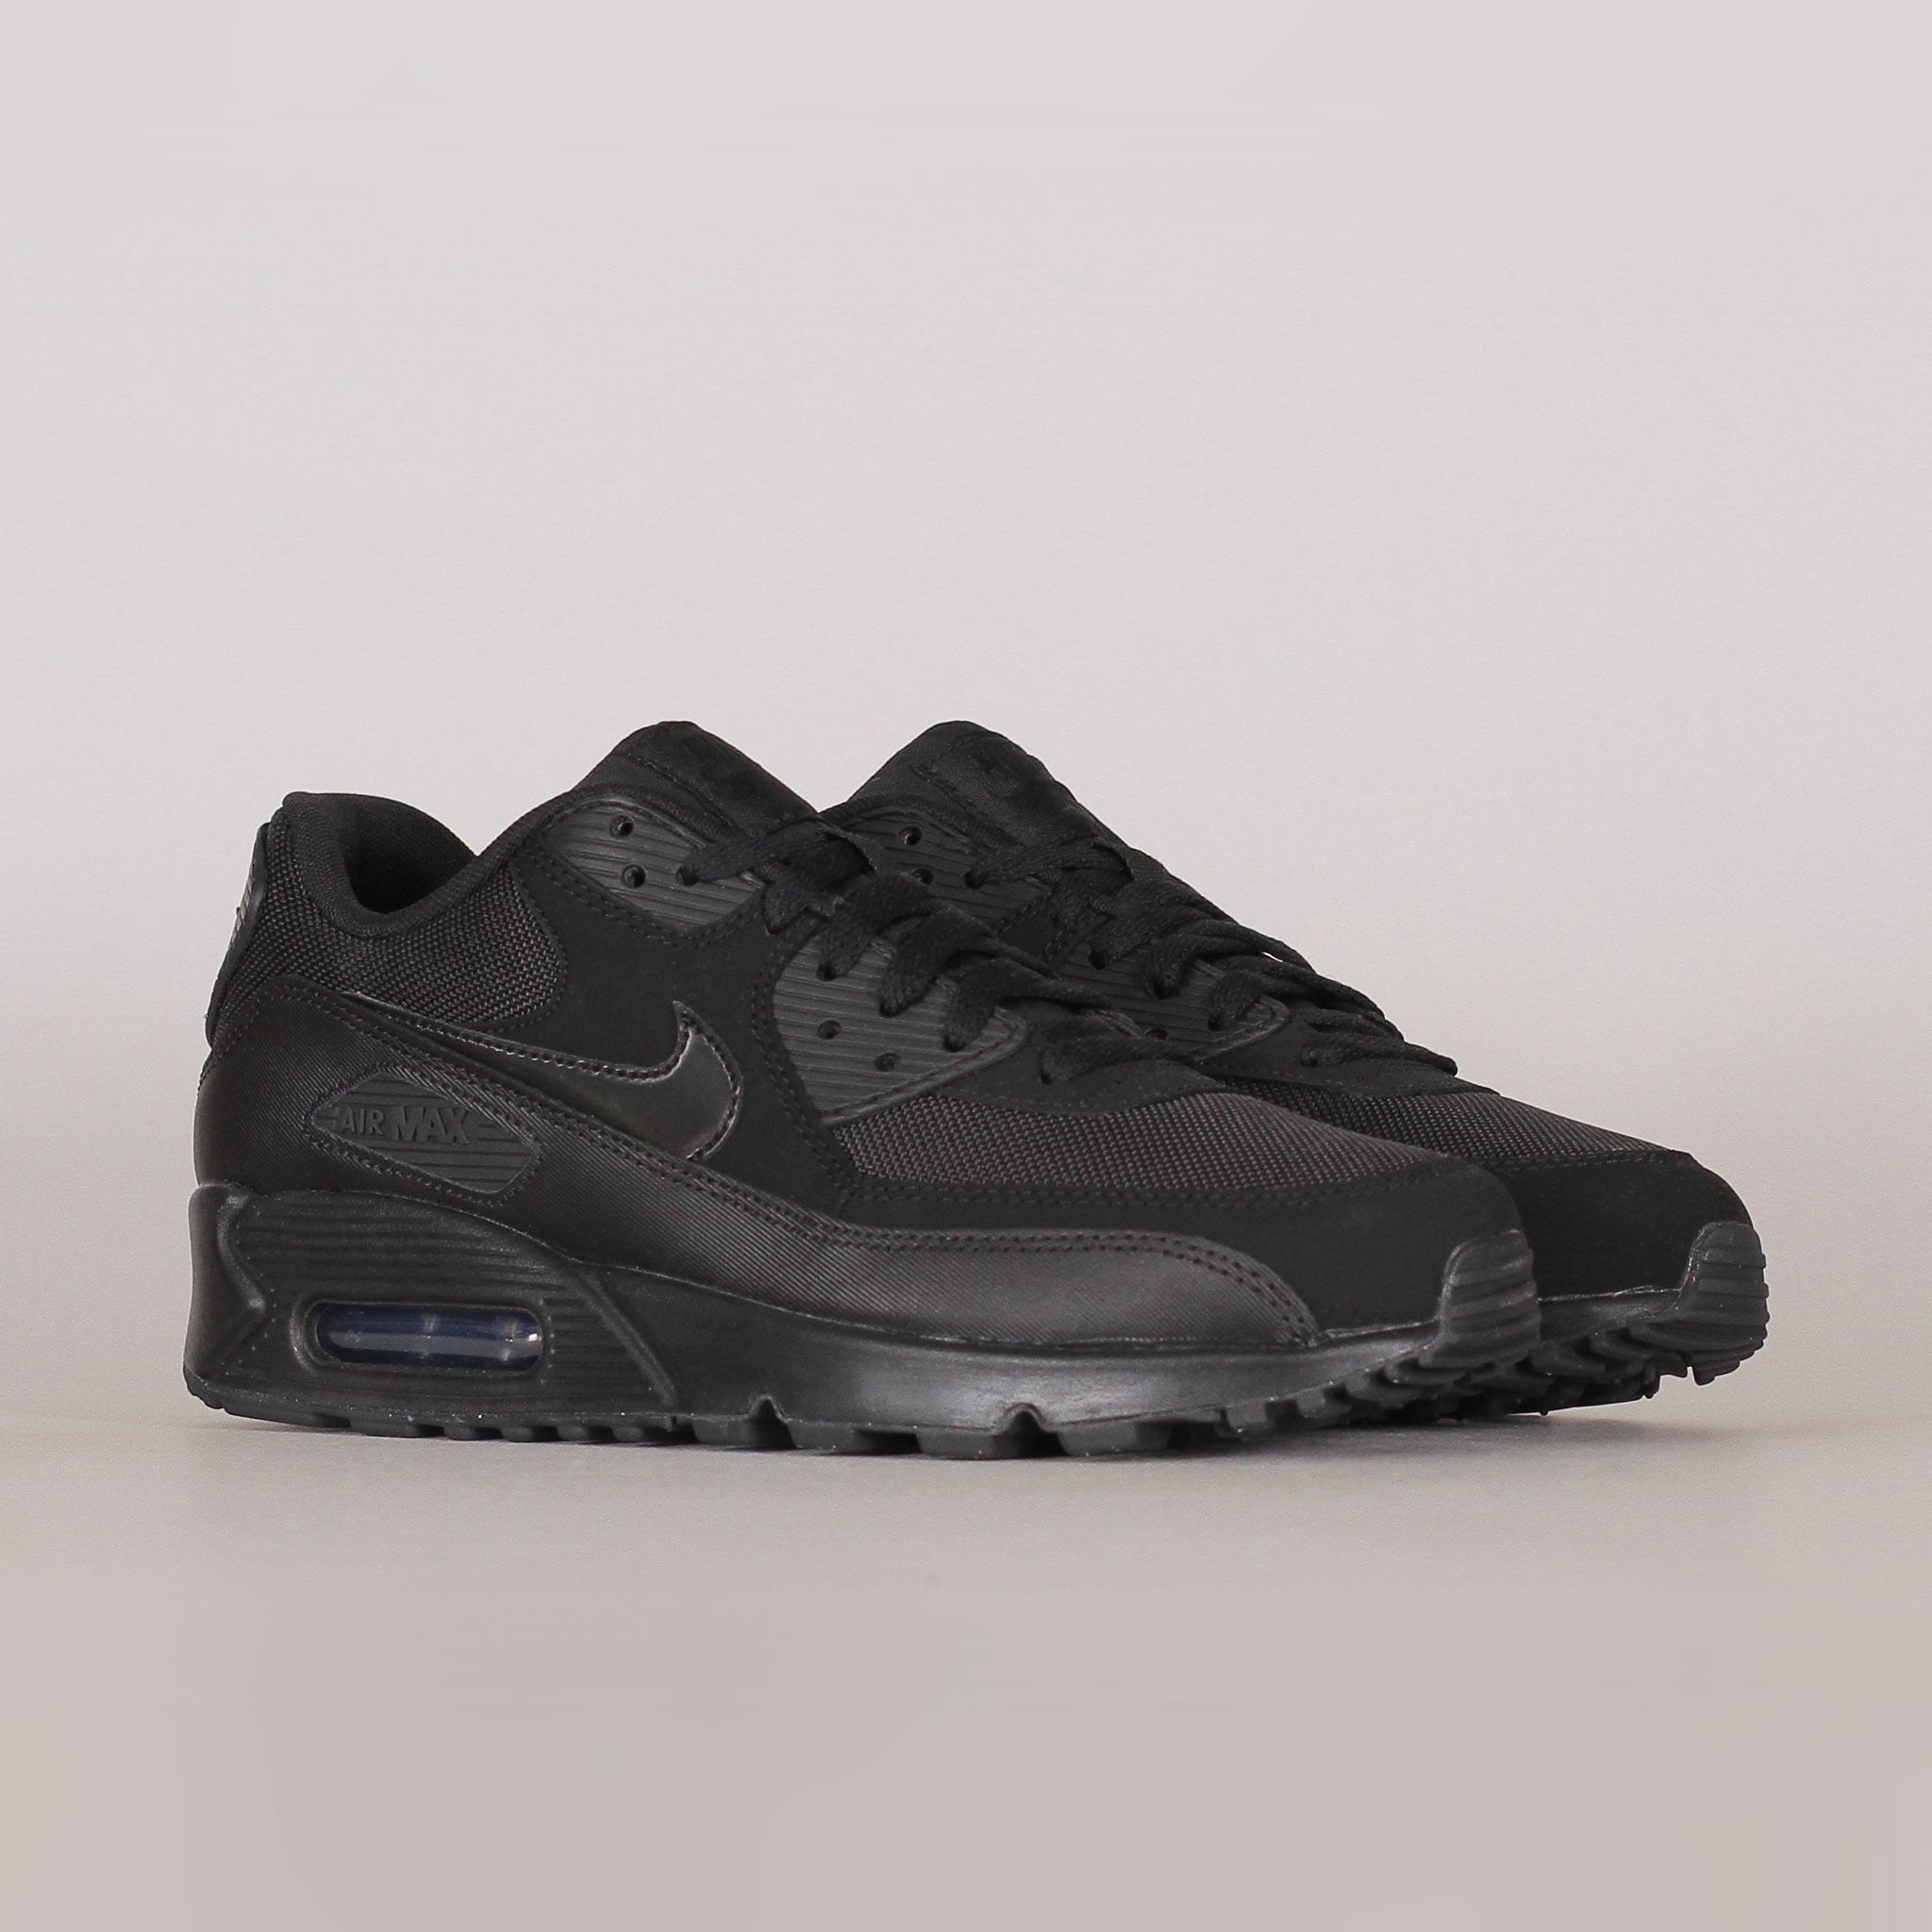 Nike Air Max 90 Essential   Svart   Sneakers   537384 090